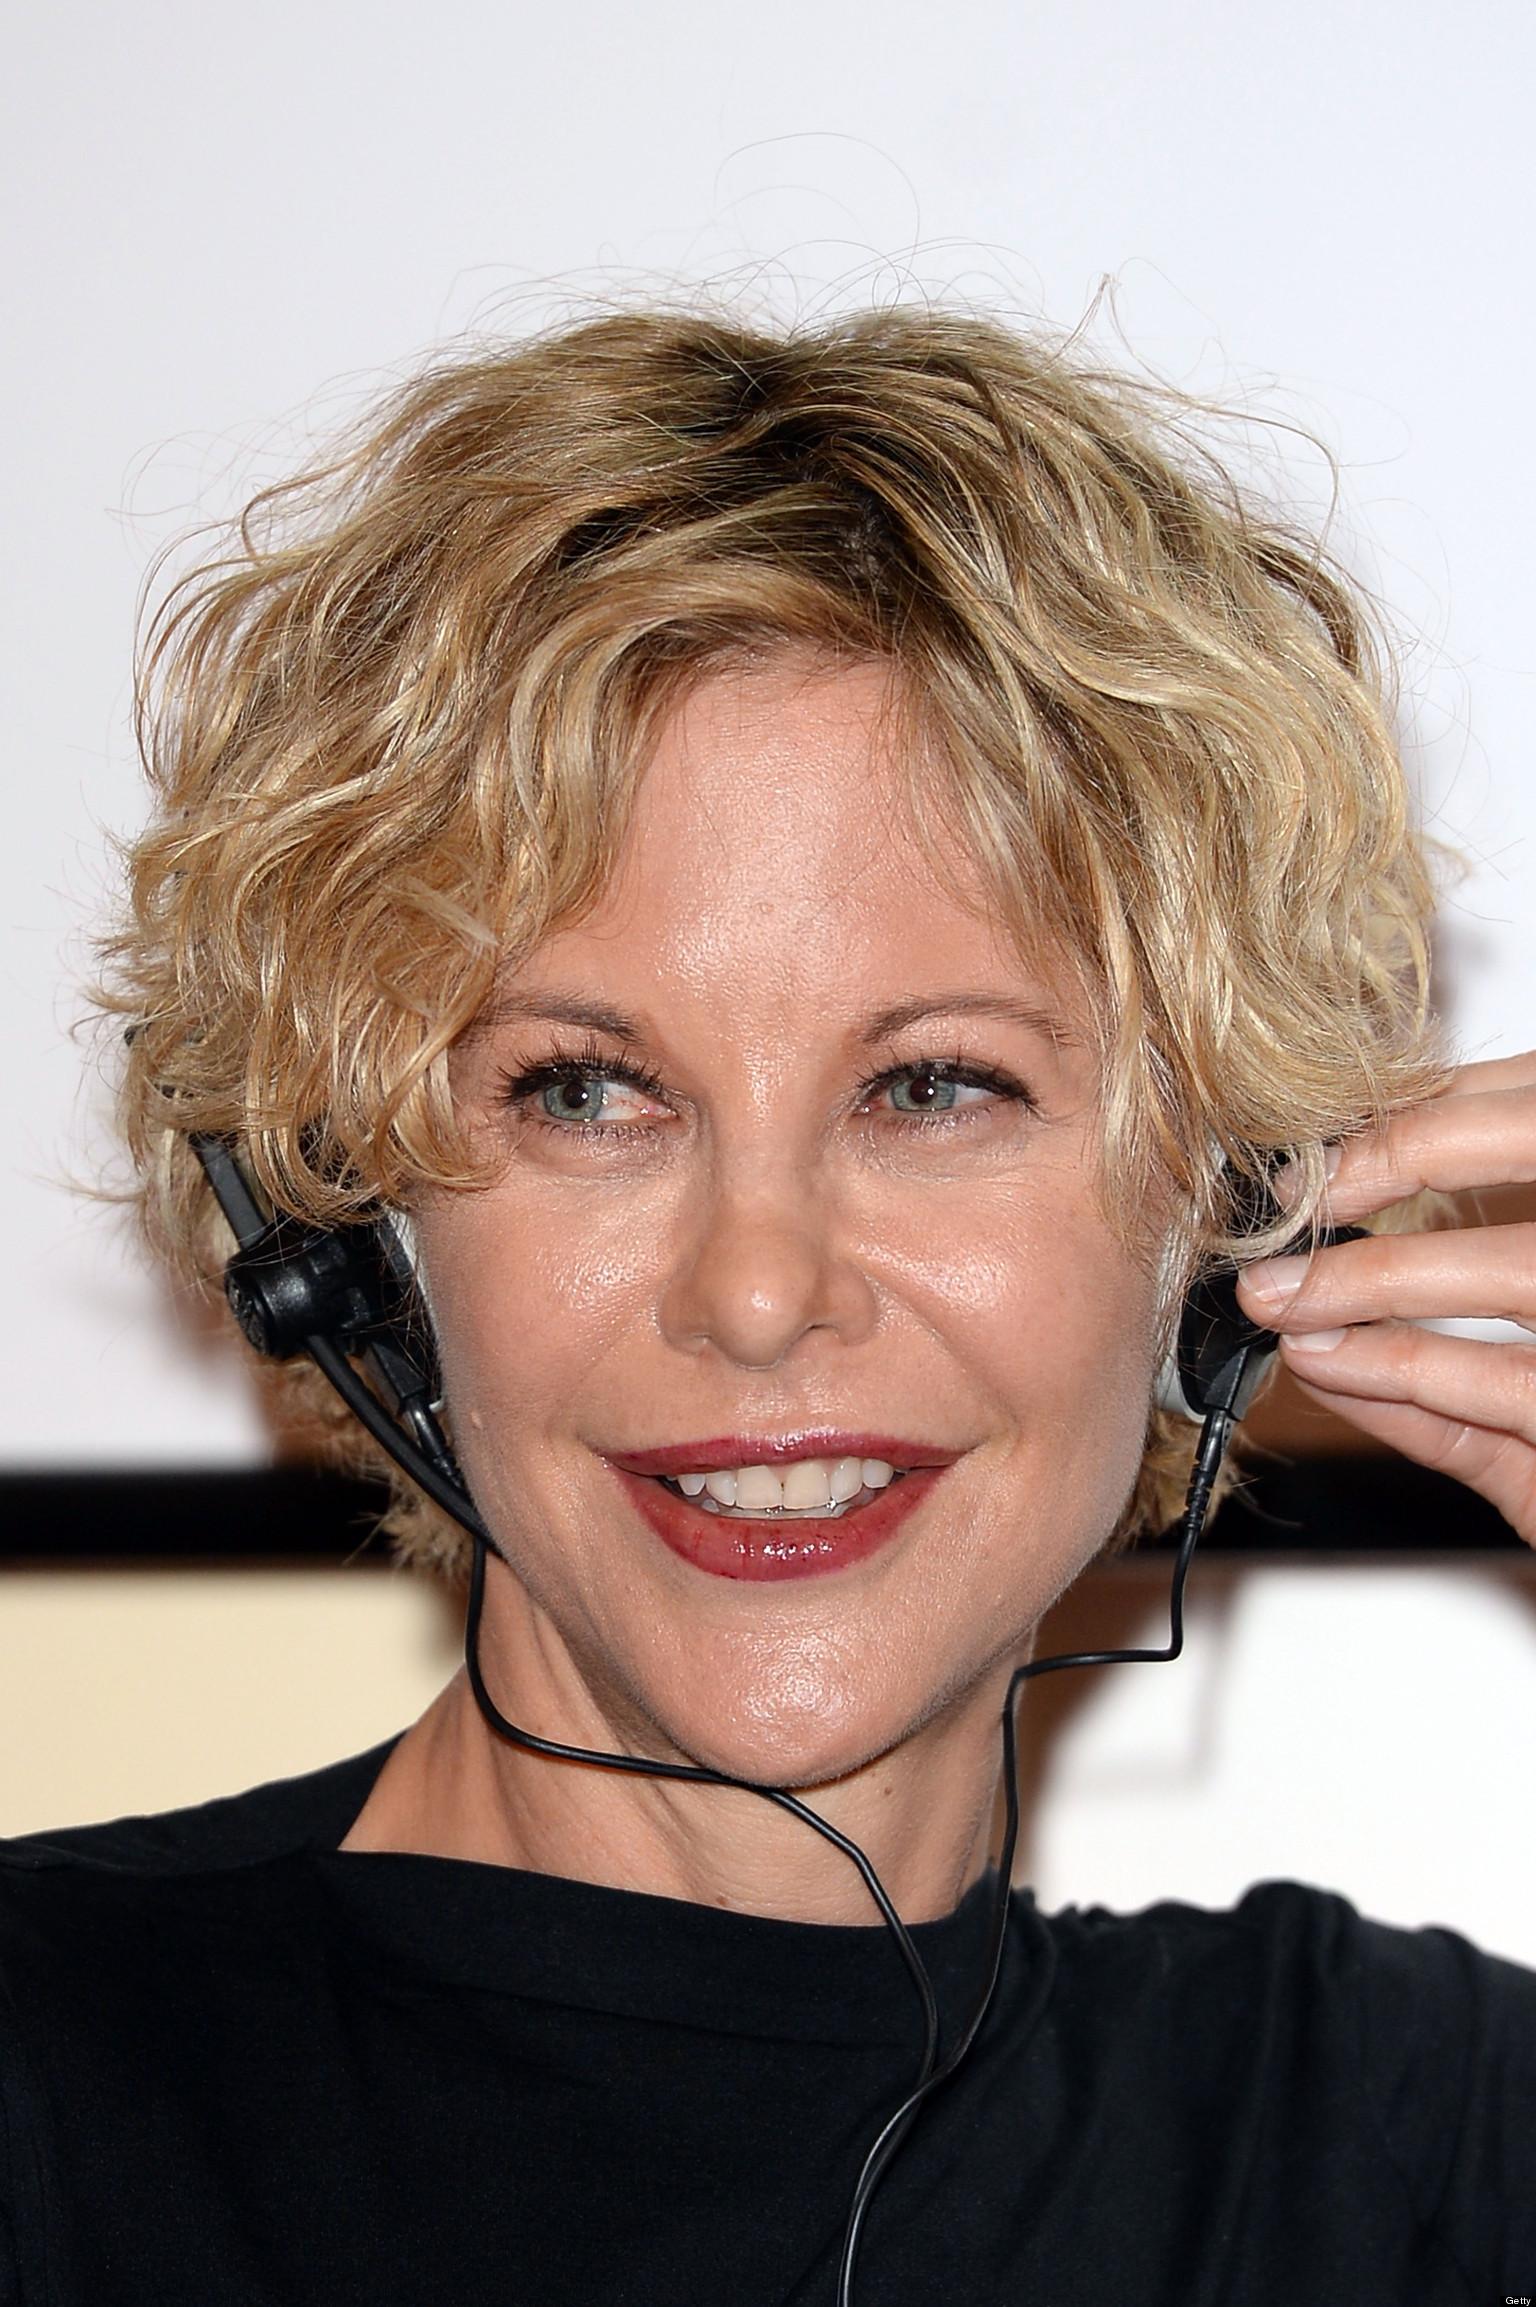 Meg Ryan Wearing Headphones: Where Has She Been? | HuffPost